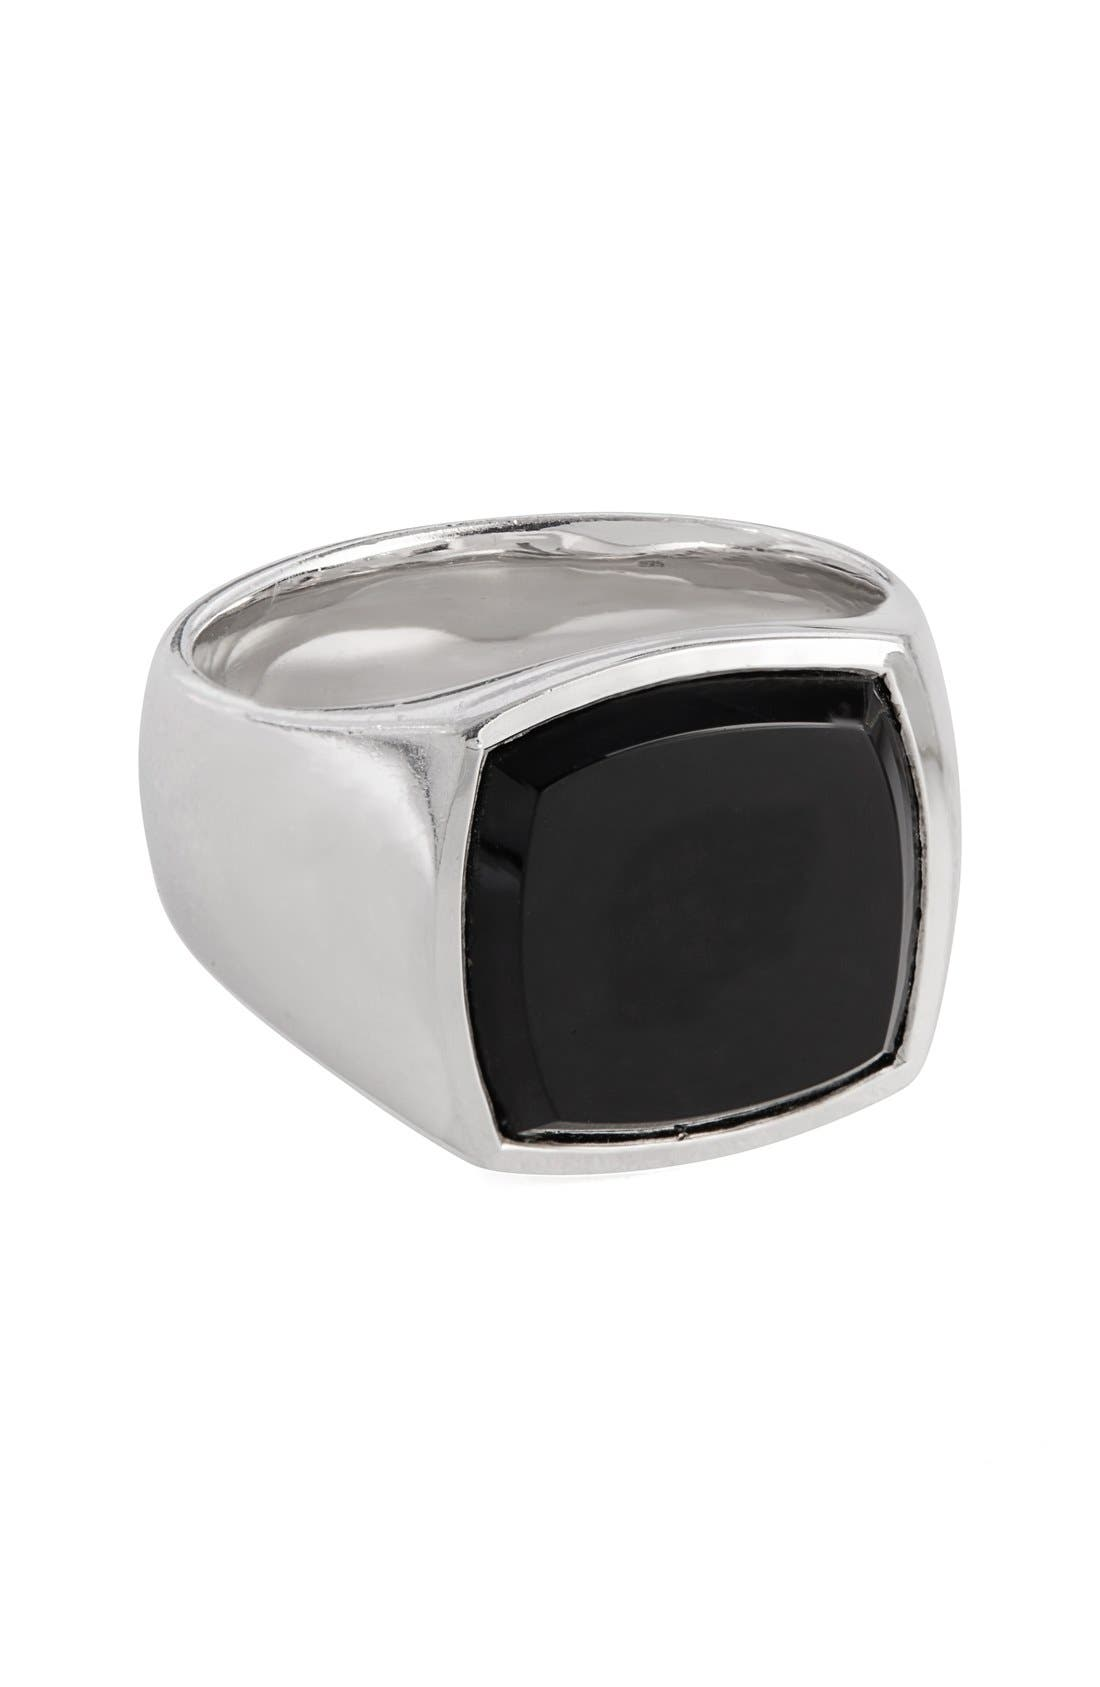 Black Onyx Cushion Signet Ring,                         Main,                         color, 041